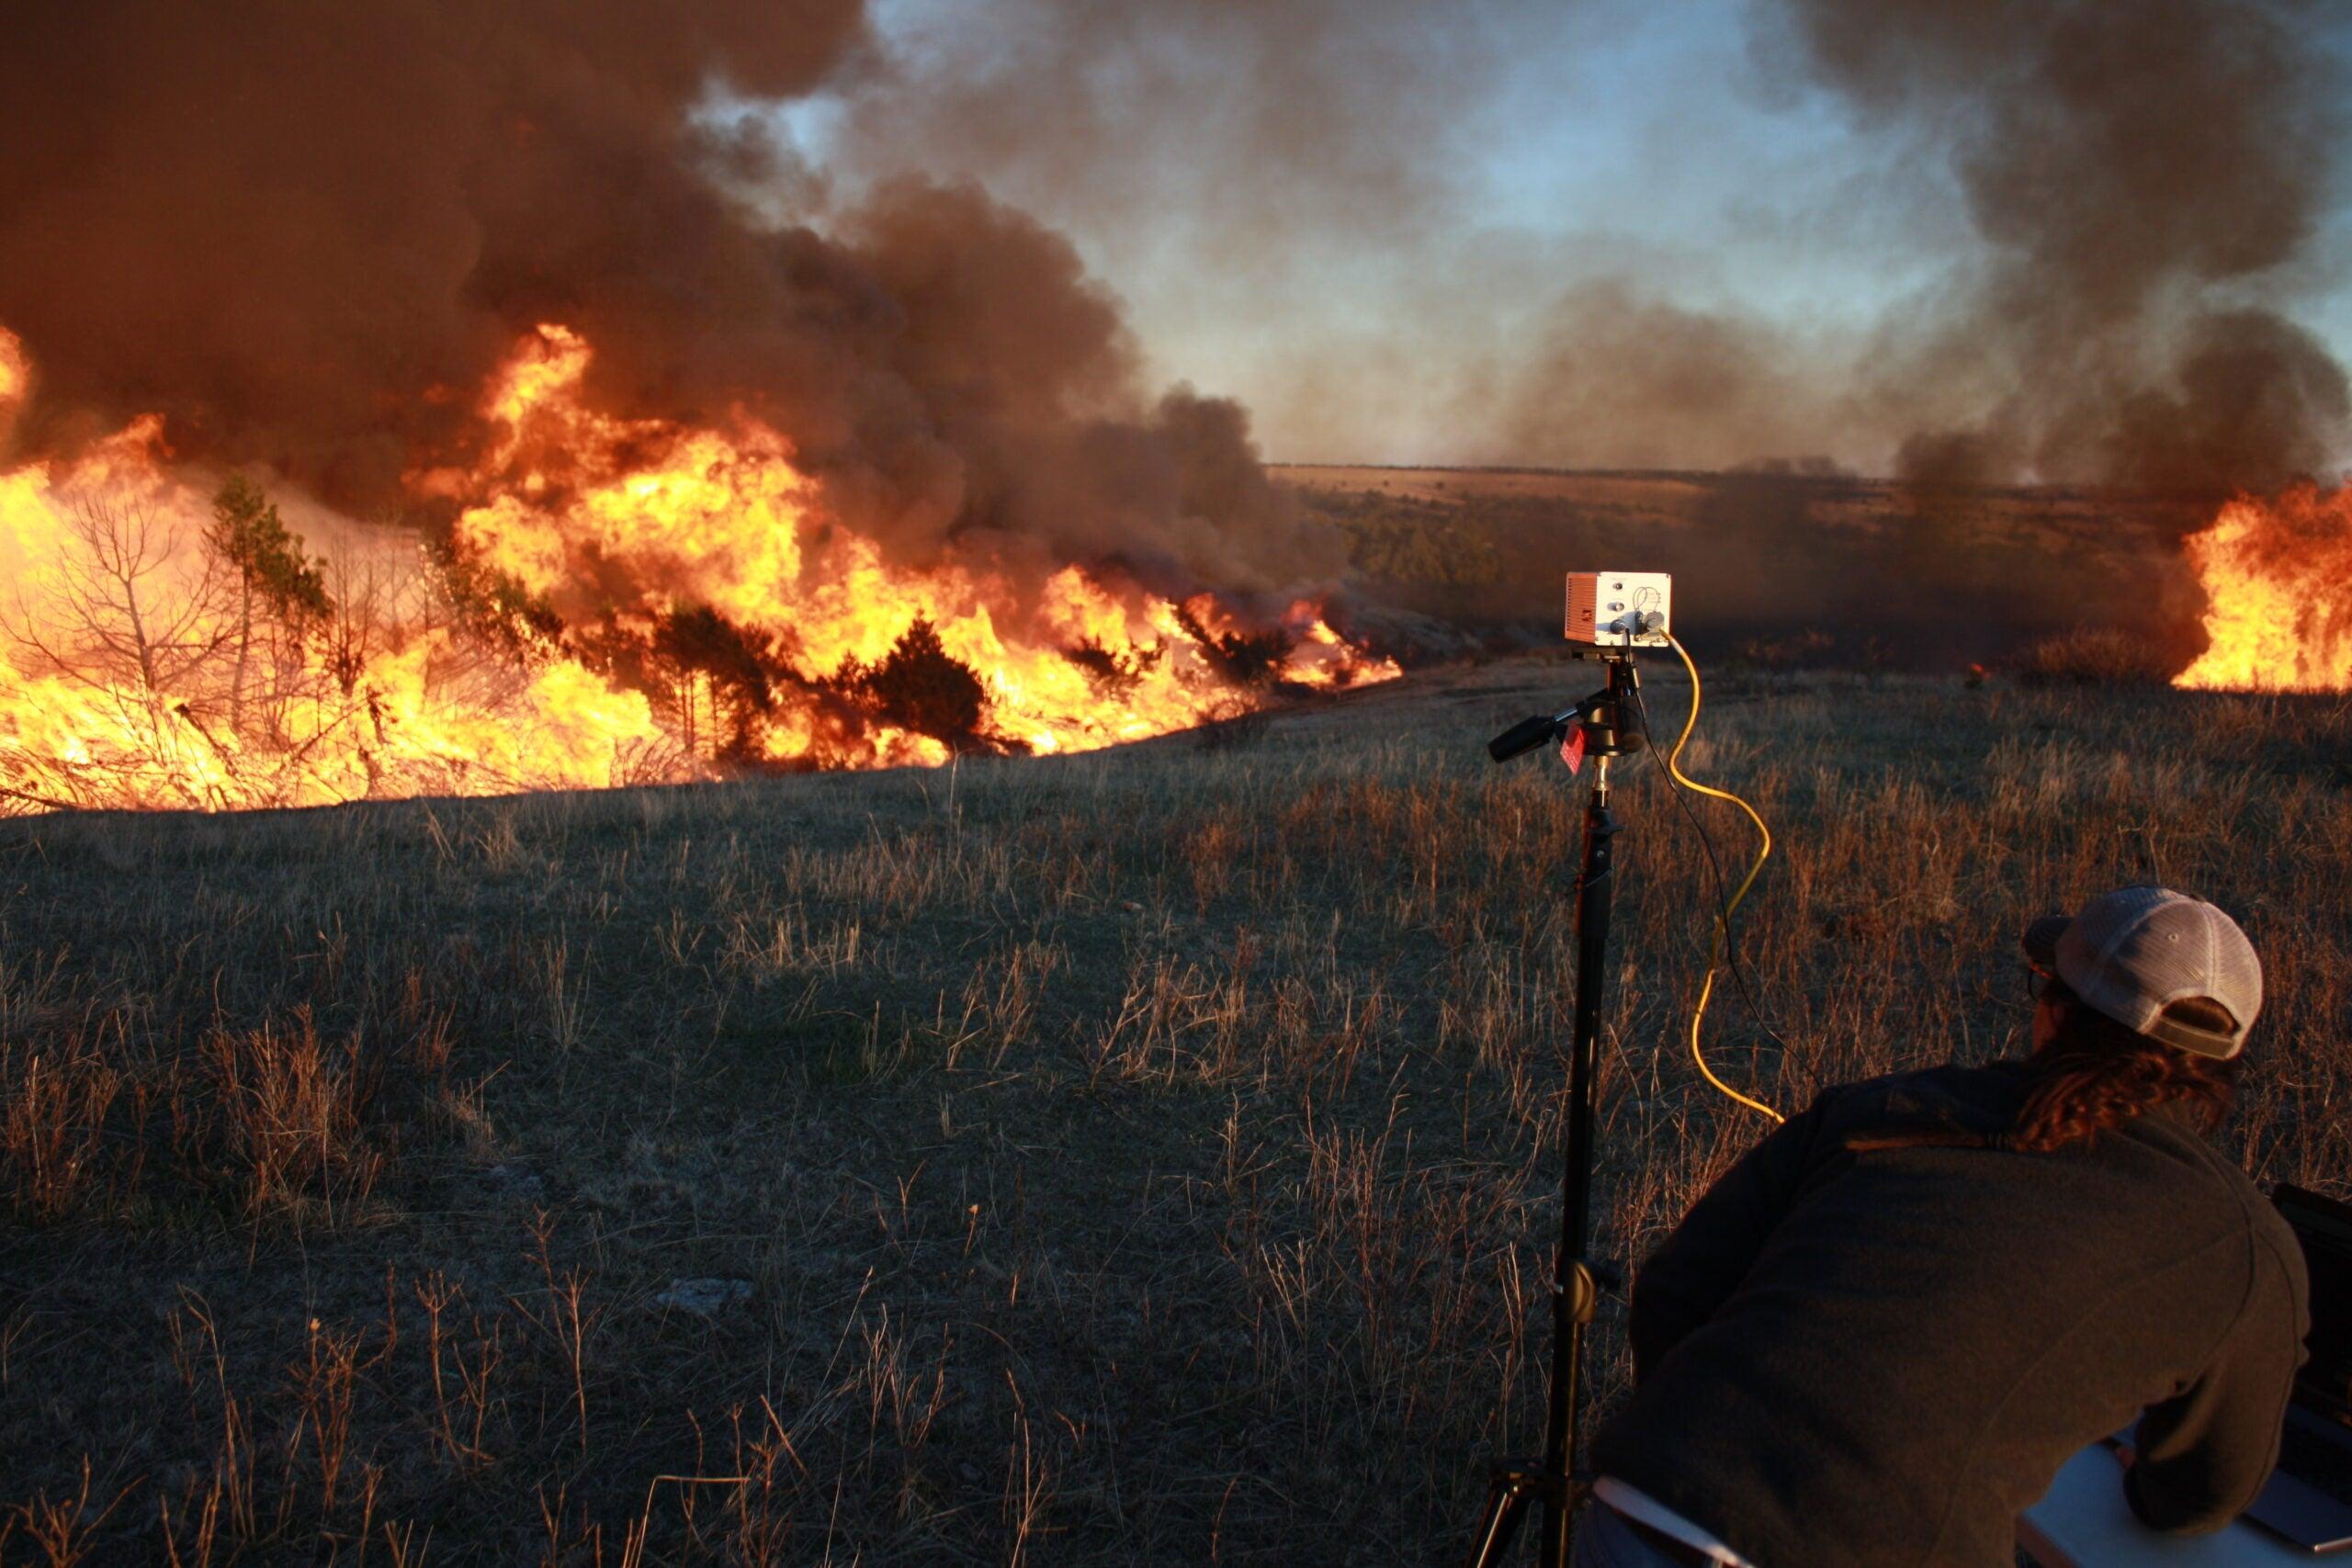 UNL Graduate student Christina Bielski recorded data during a high intensity prescribed fire burning through juniper-invaded grassland on private property.